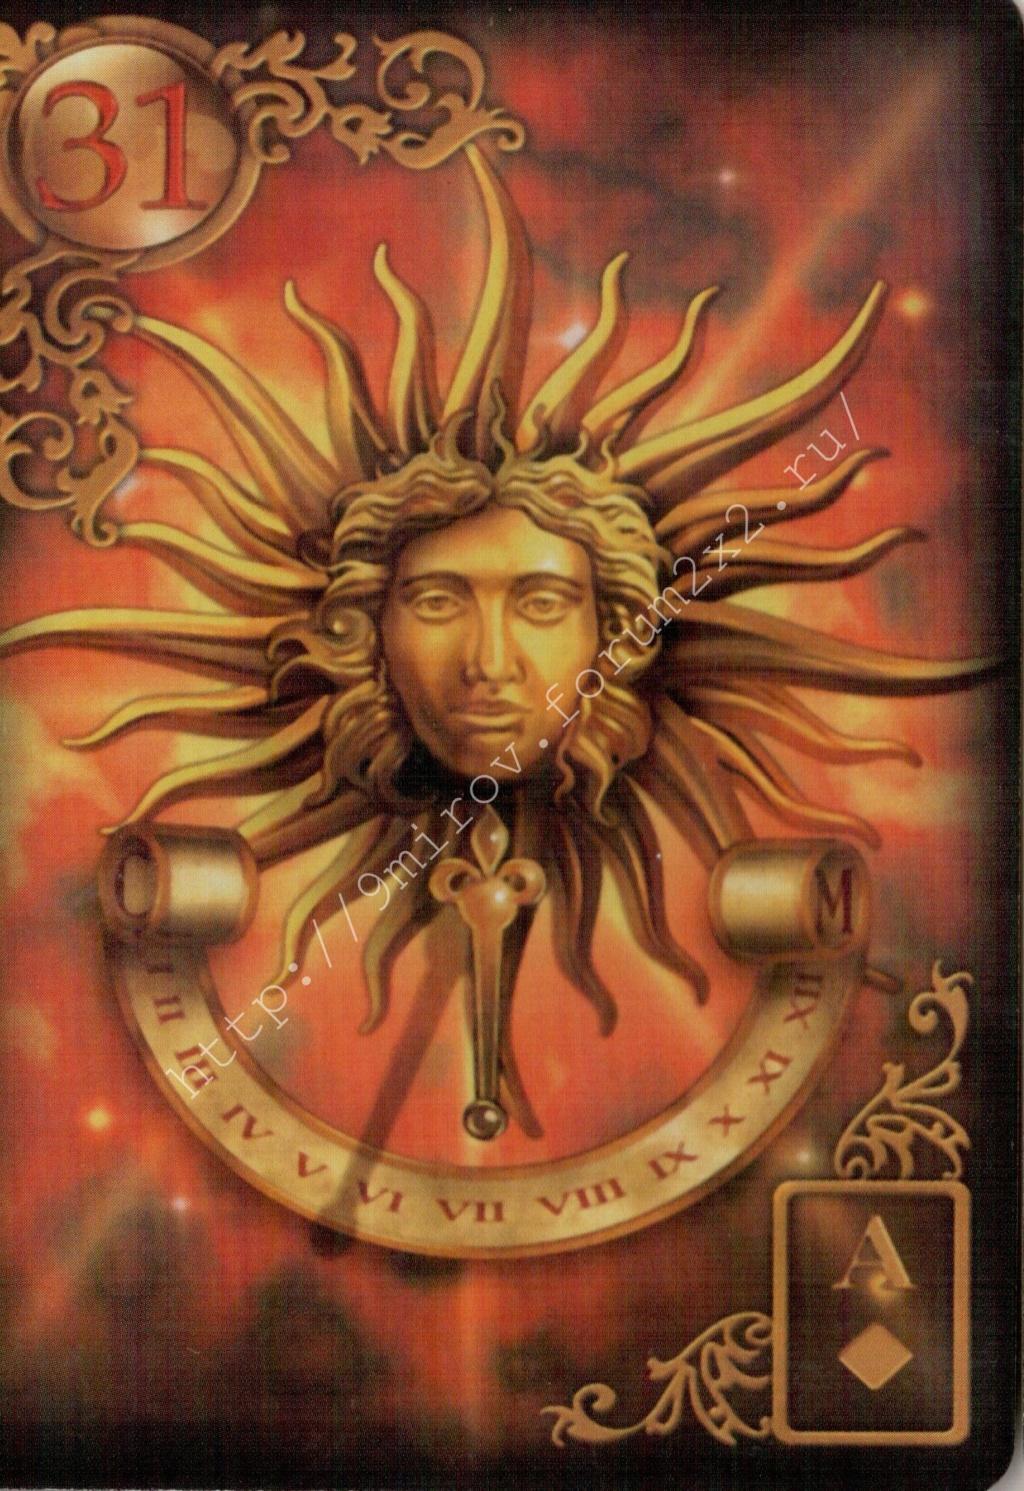 Золотые мечты Ленорман (Расширенное издание) | Gilded Reverie Lenormand. Галерея.  Water122